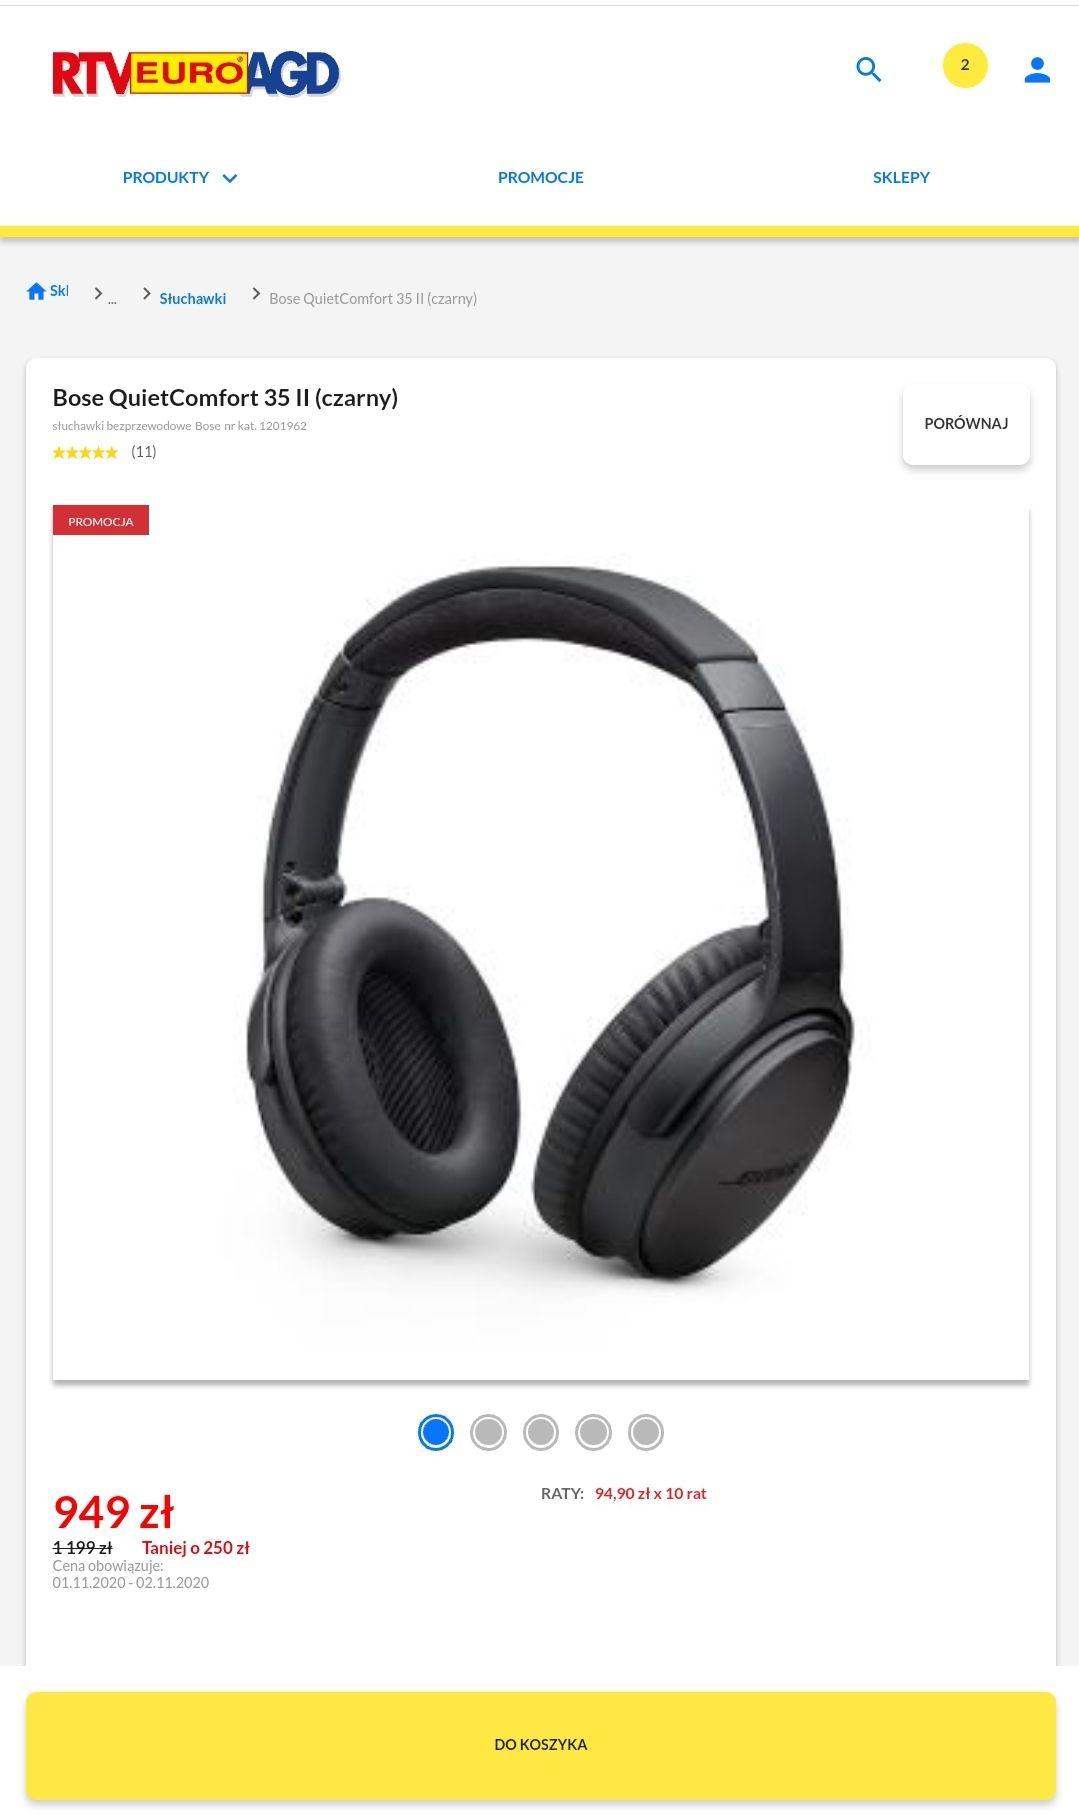 Słuchawki Bose Quietcomfort 35 czarne za 949